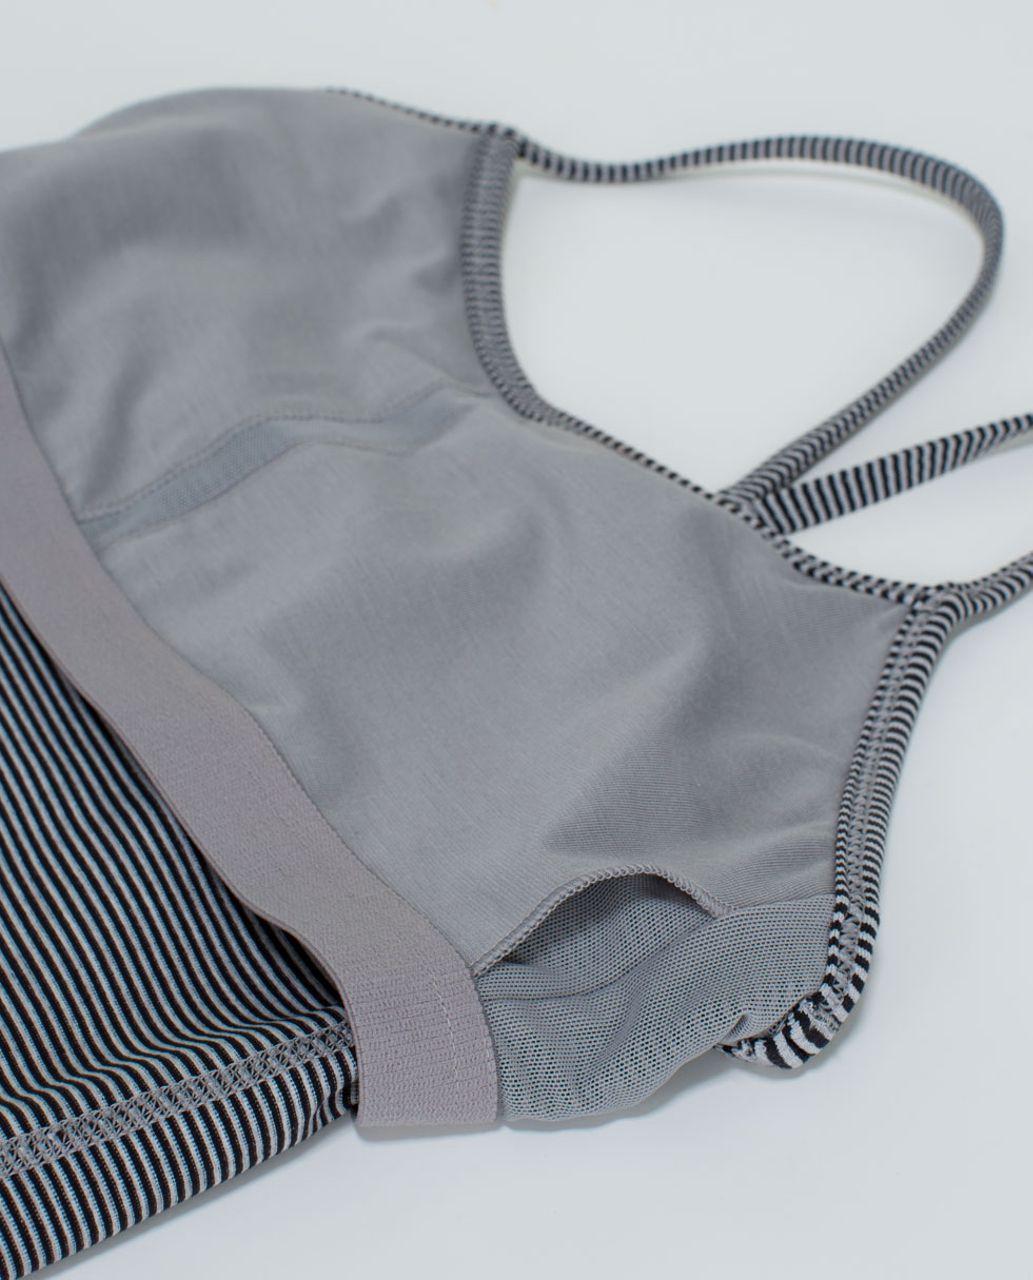 Lululemon Power Y Tank *Luon - Tonka Stripe Black Heathered Medium Grey